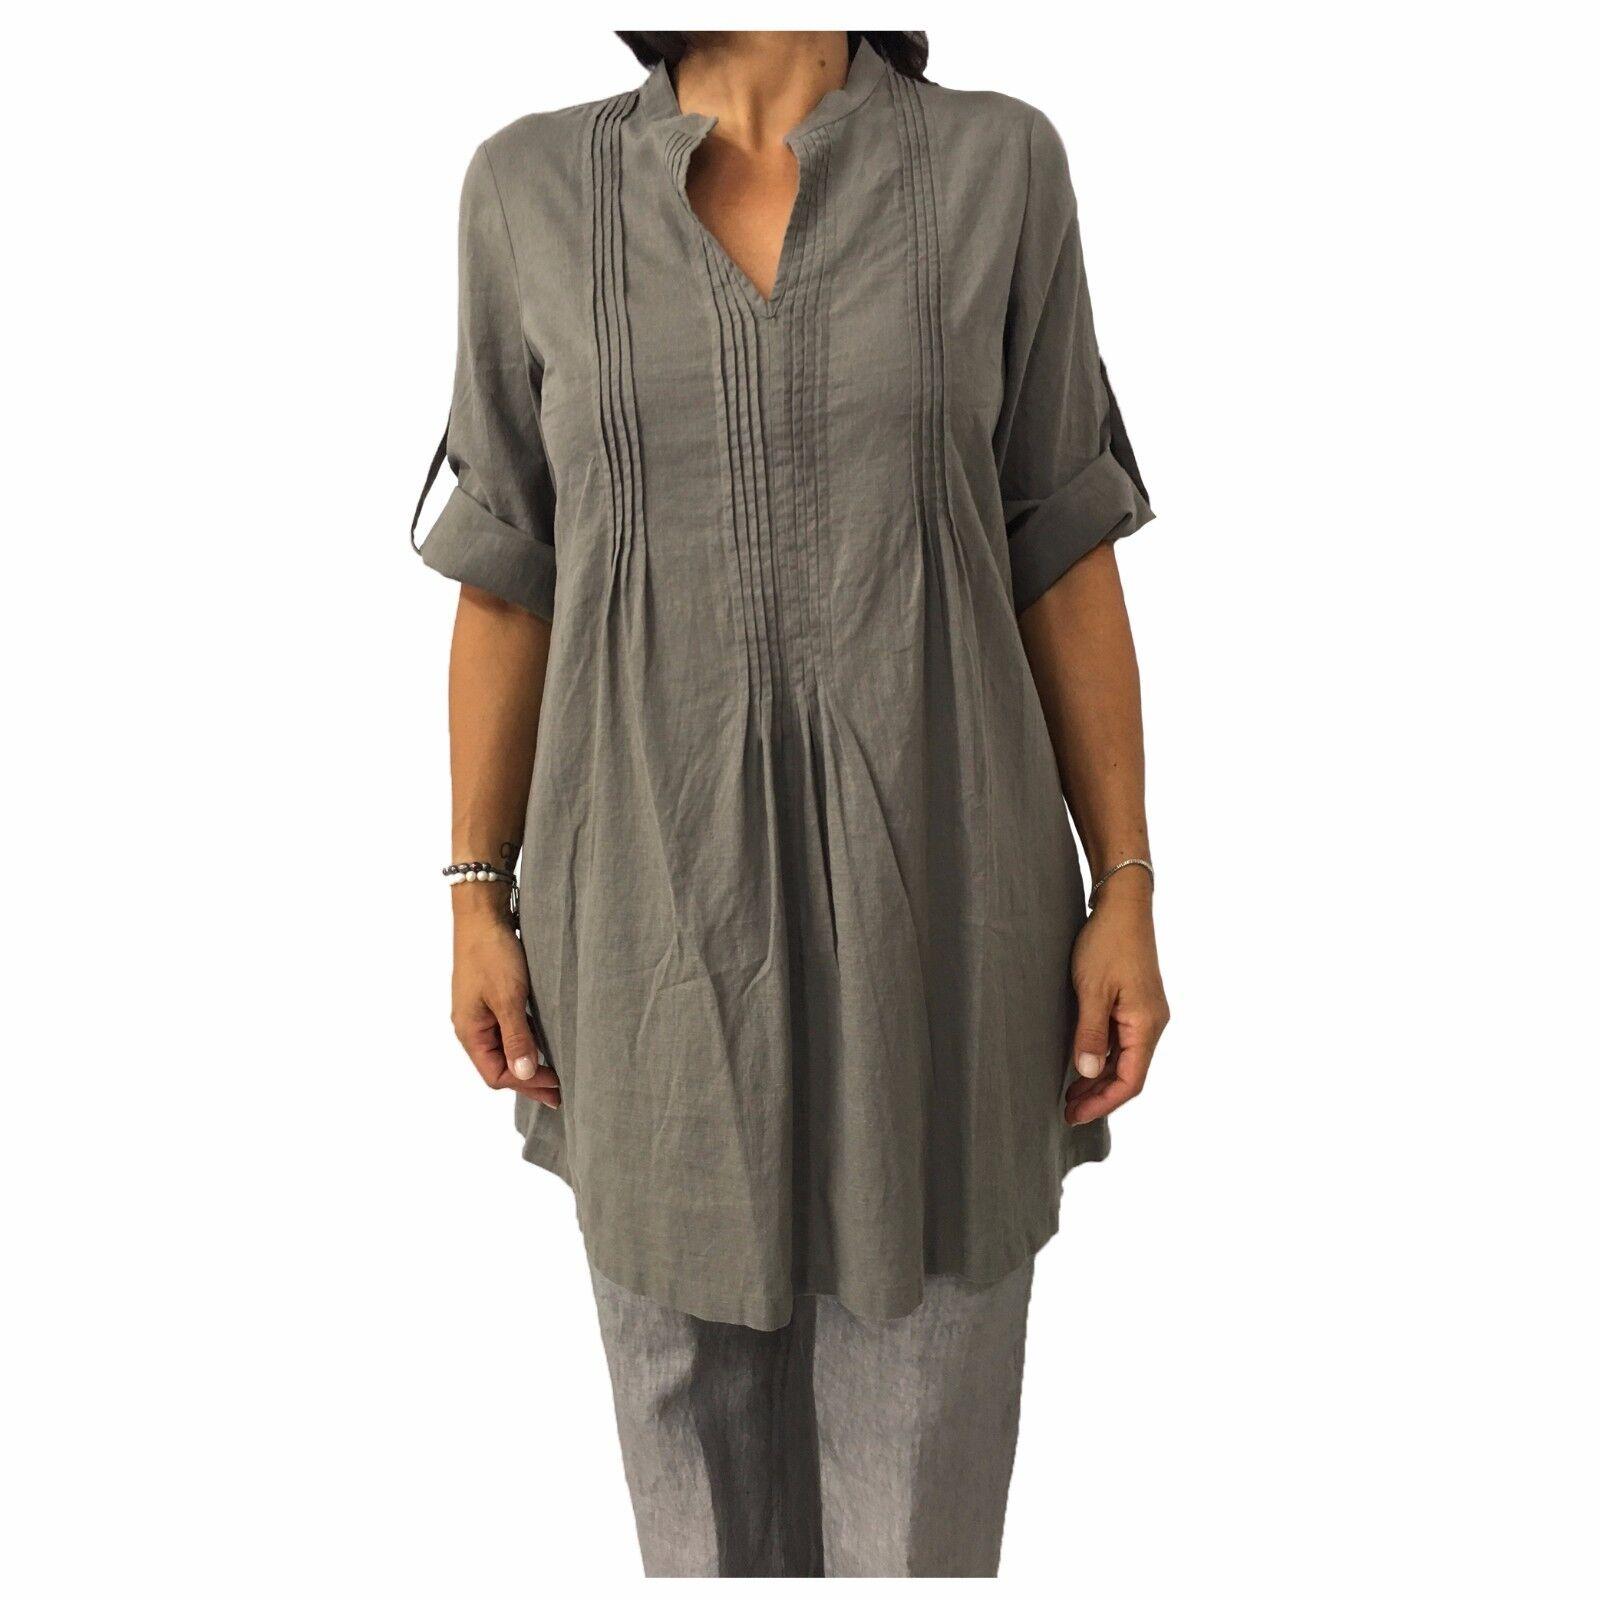 Damenhemd over taubengrau AND Material  52% Leinen 48% Baumwolle